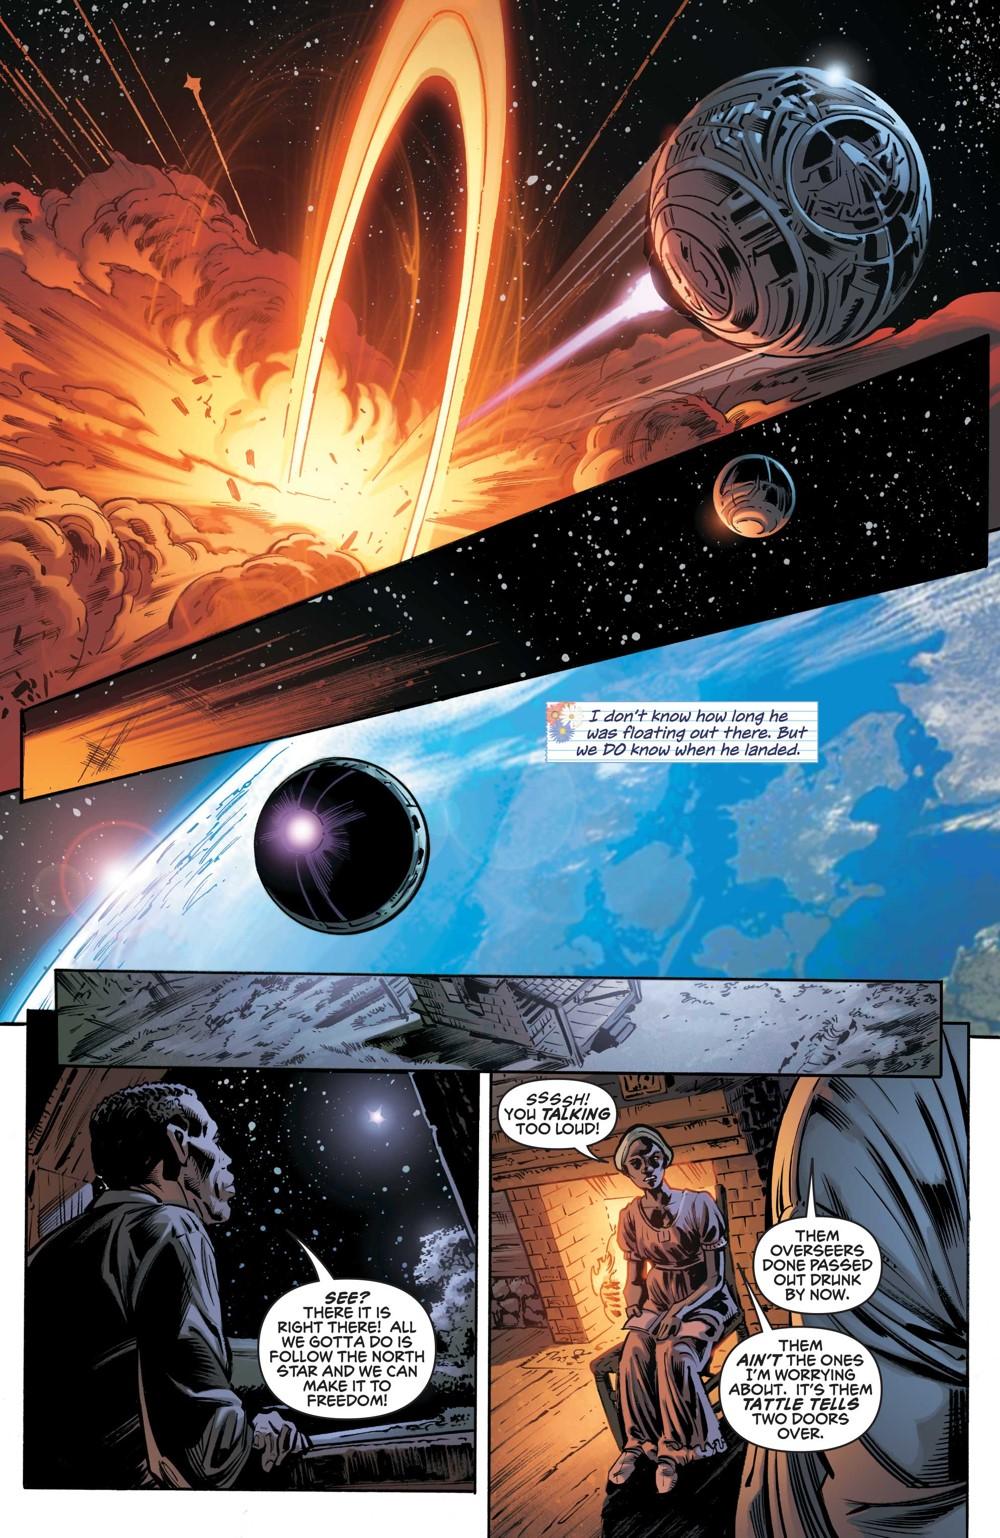 Icon-and-Rocket-Season-One-1-9_60fa2004c28722.13482331 ComicList Previews: ICON AND ROCKET SEASON ONE #1 (OF 6)